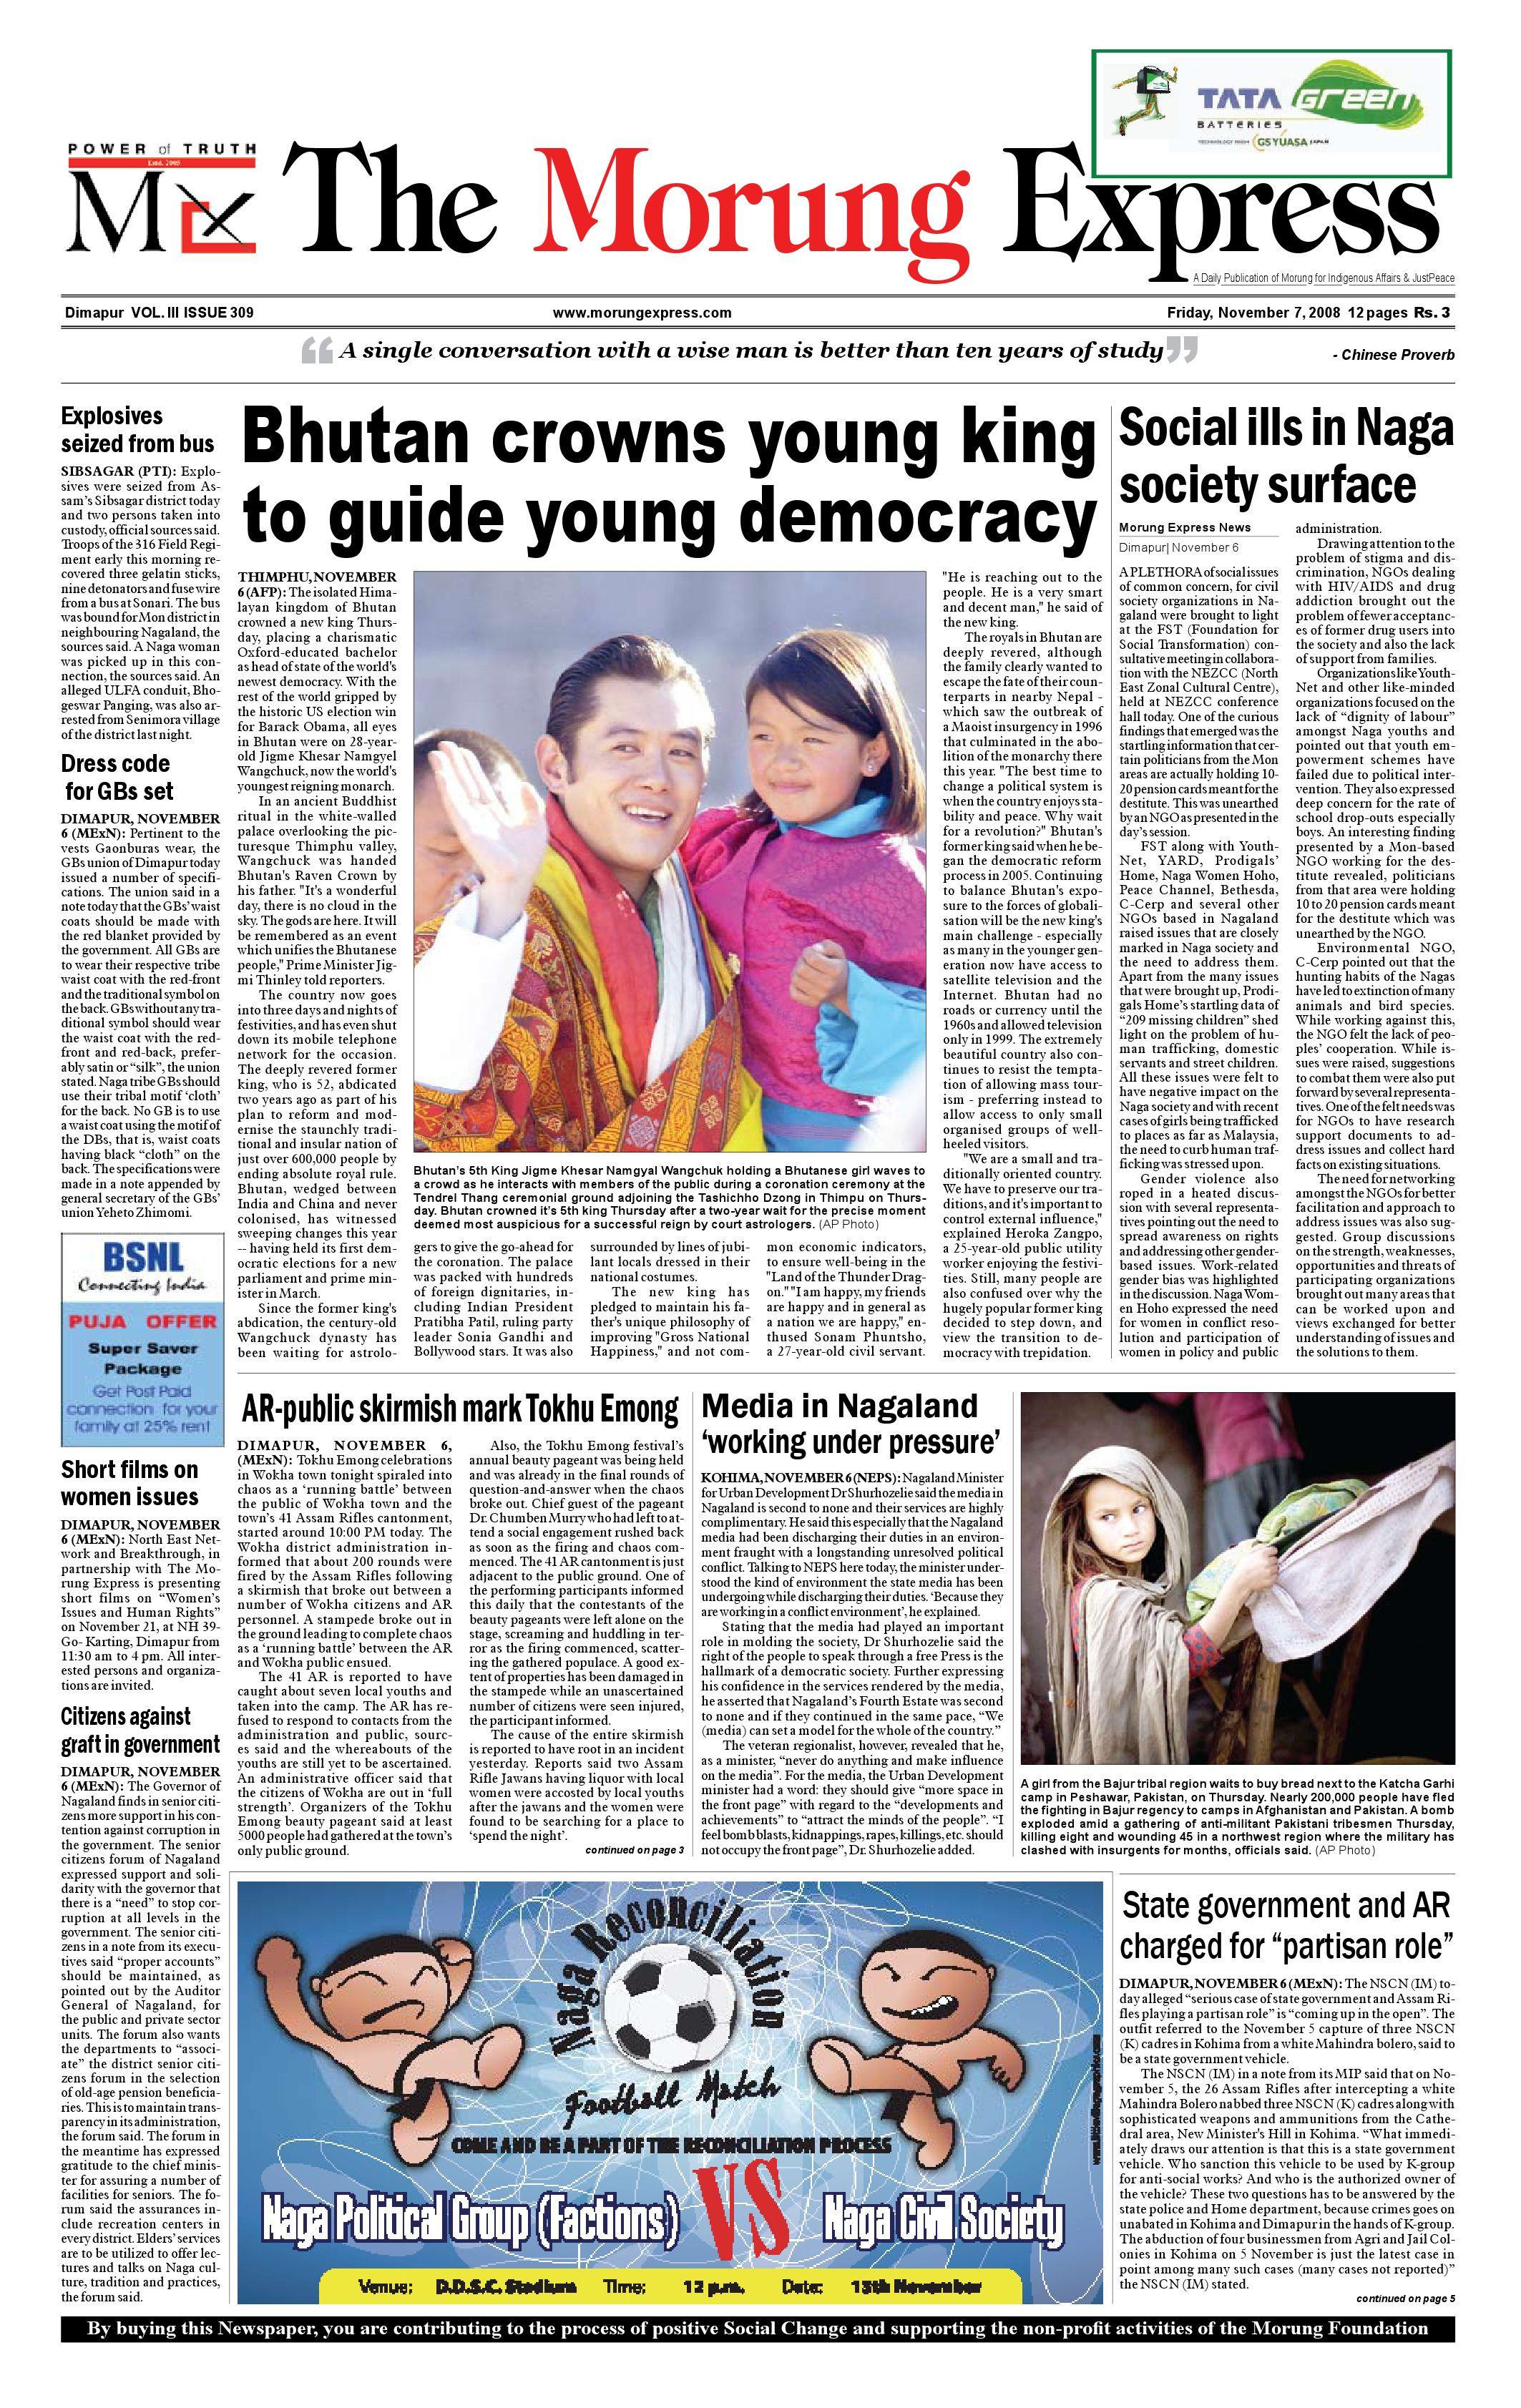 The Morung Express | Express news of Nagaland by The Morung